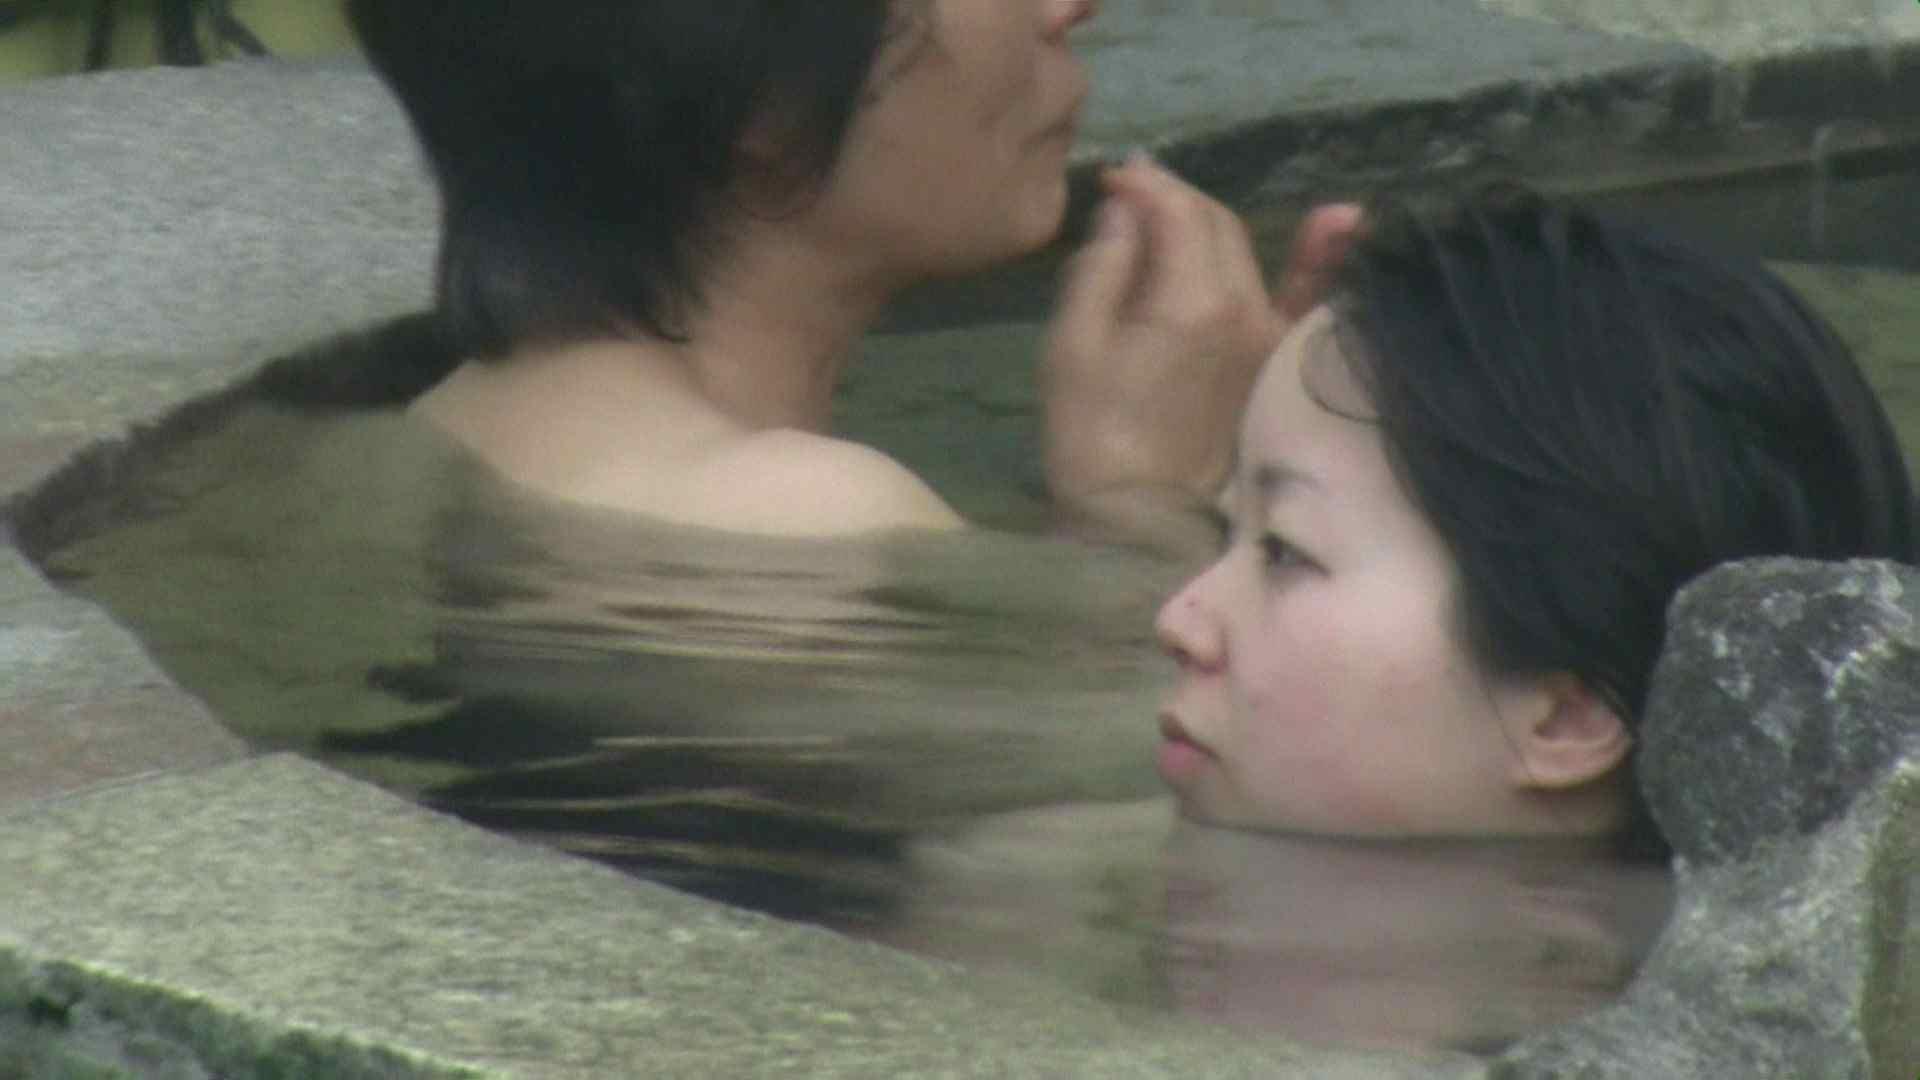 Aquaな露天風呂Vol.06【VIP】 盗撮大放出 ヌード画像 96連発 38